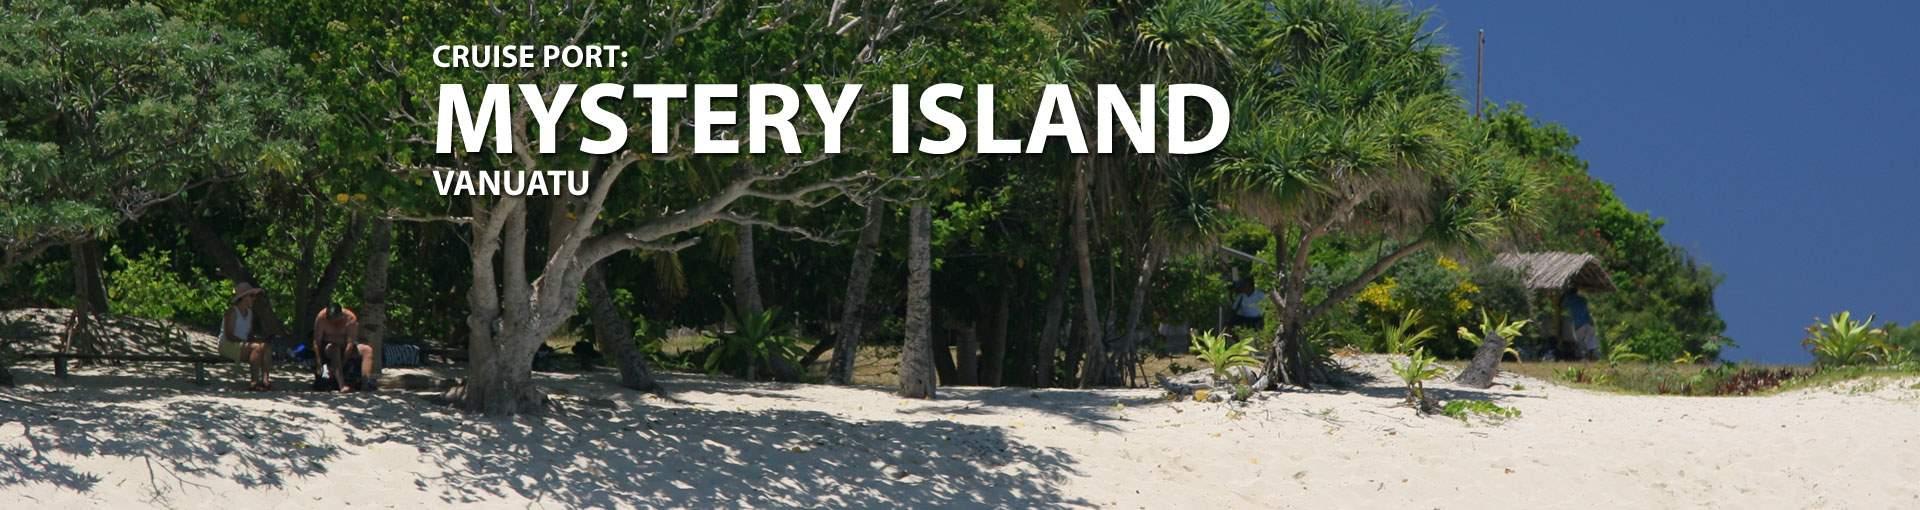 Cruises to Mystery Island Vanuatu